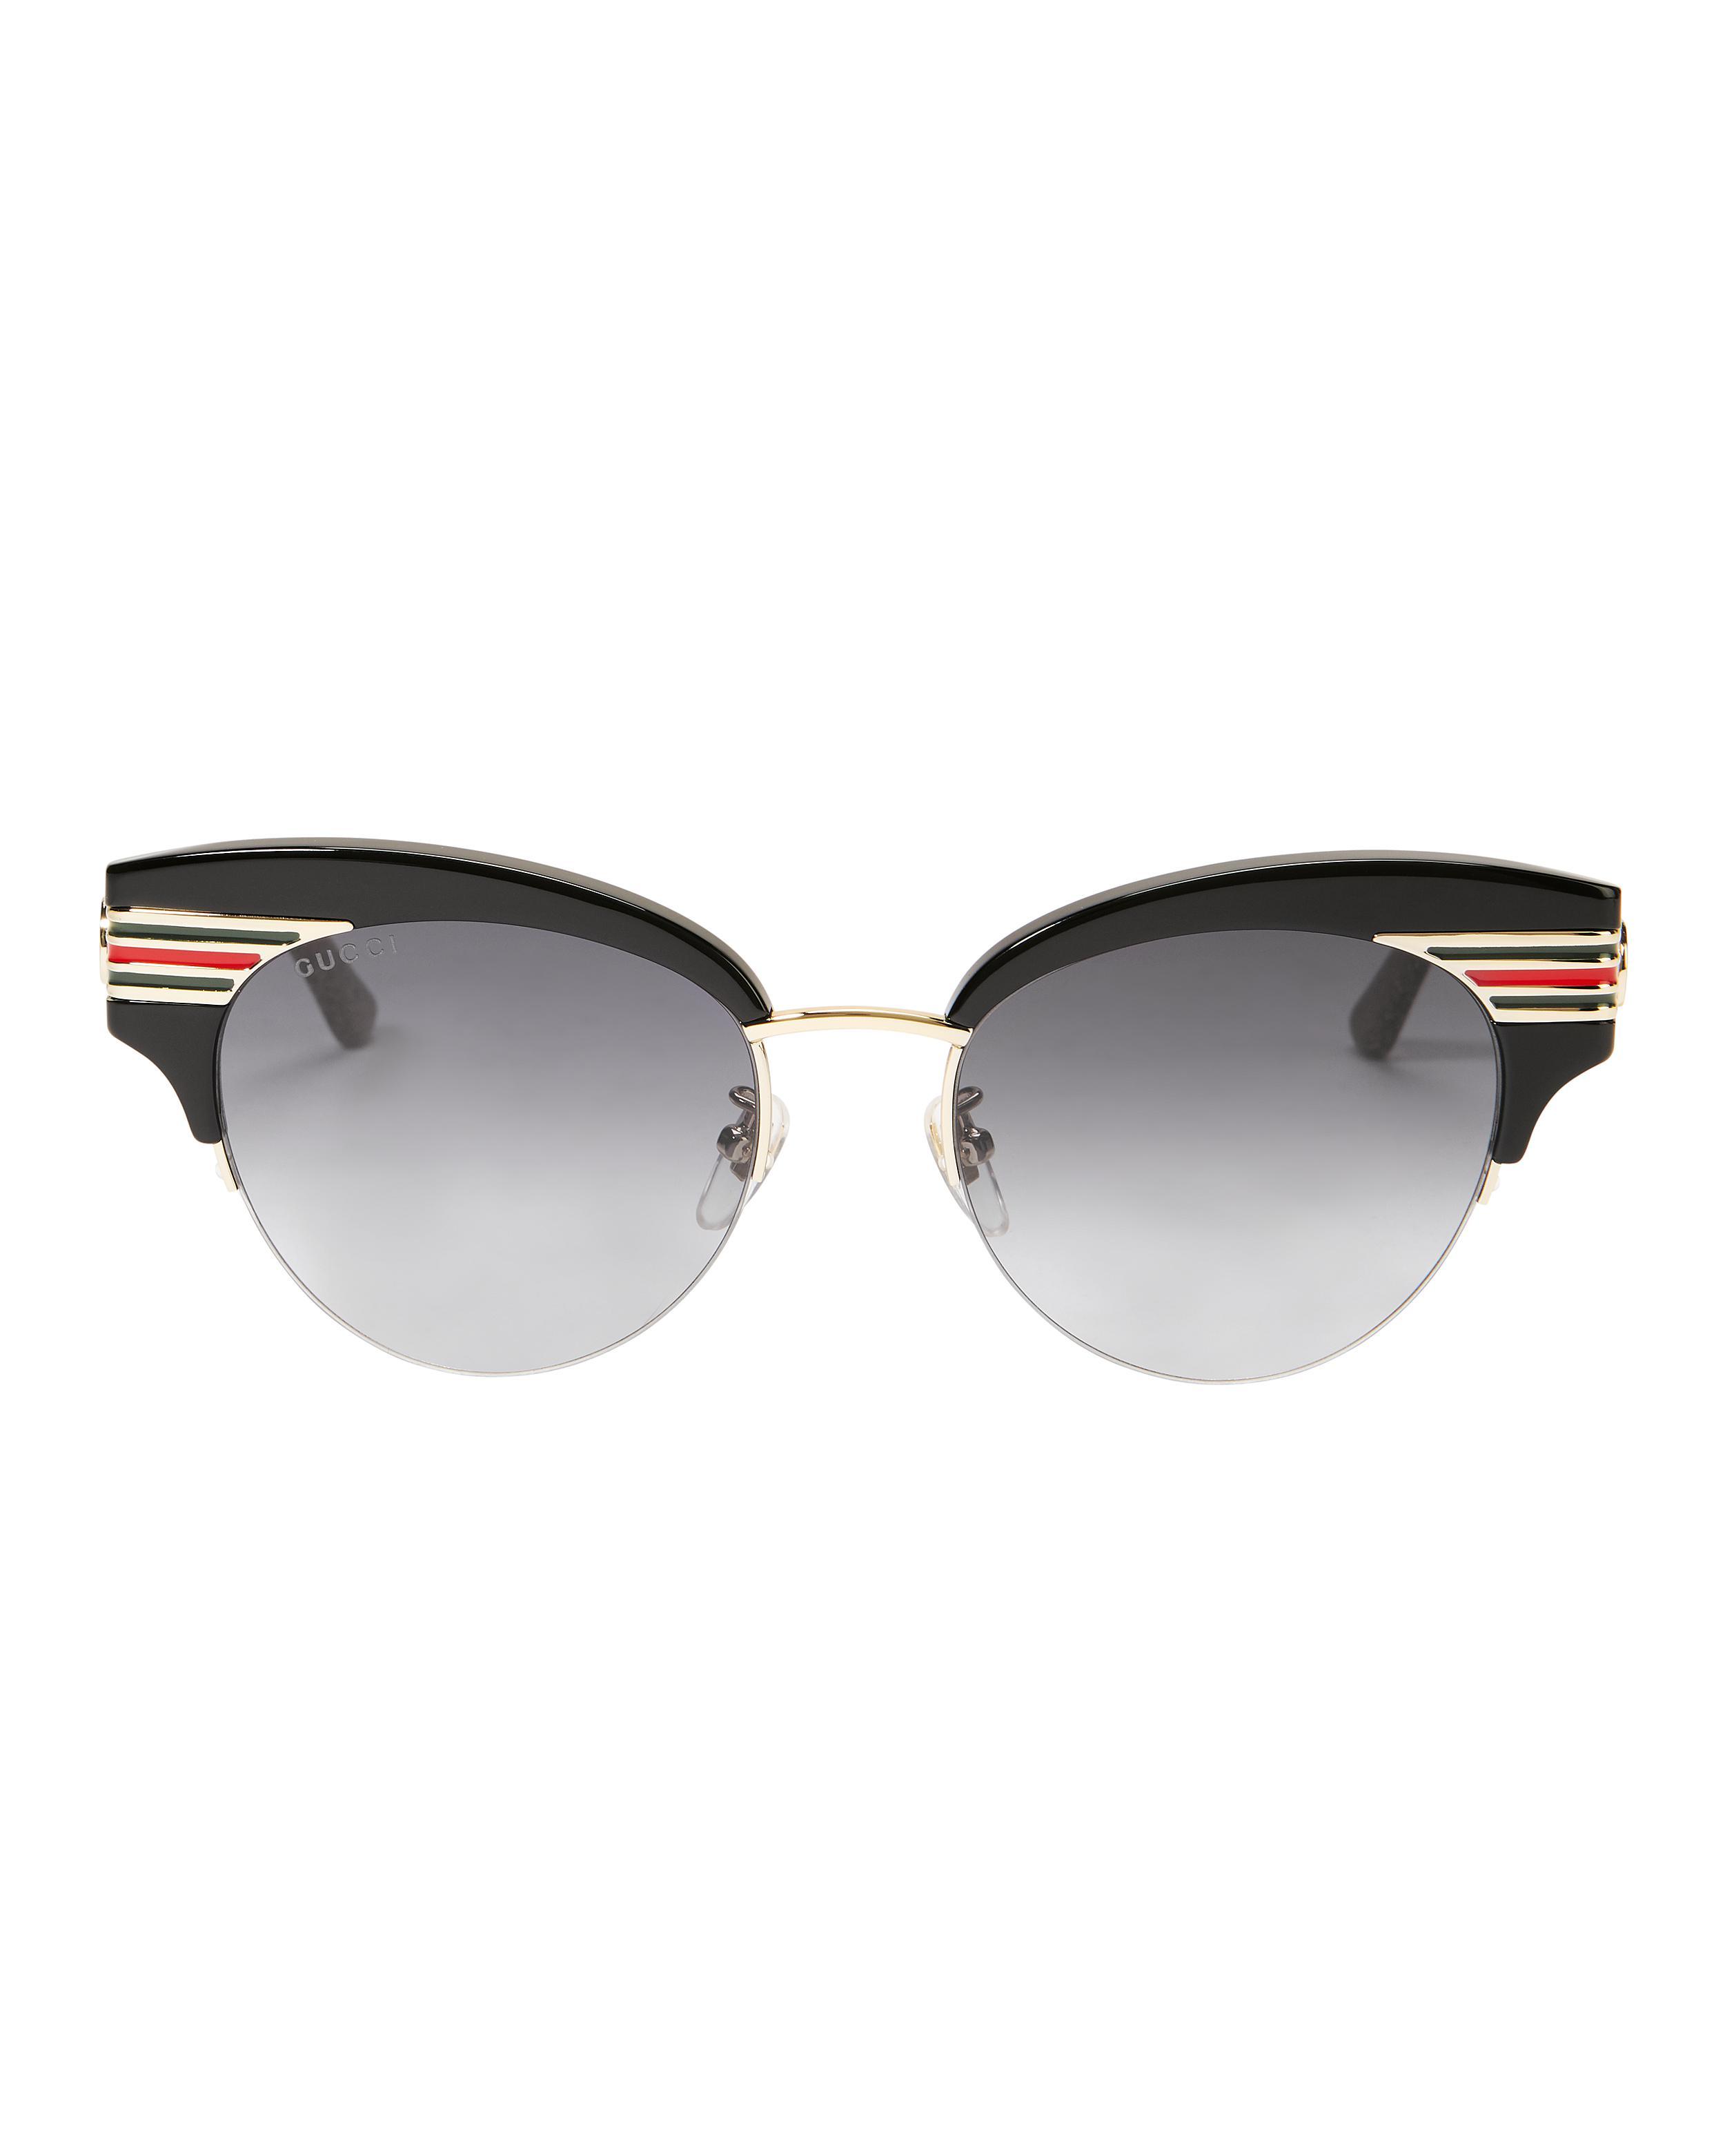 60c1c6f3058 Gucci - Black Vintage Signature Stripe Sunglasses - Lyst. View fullscreen